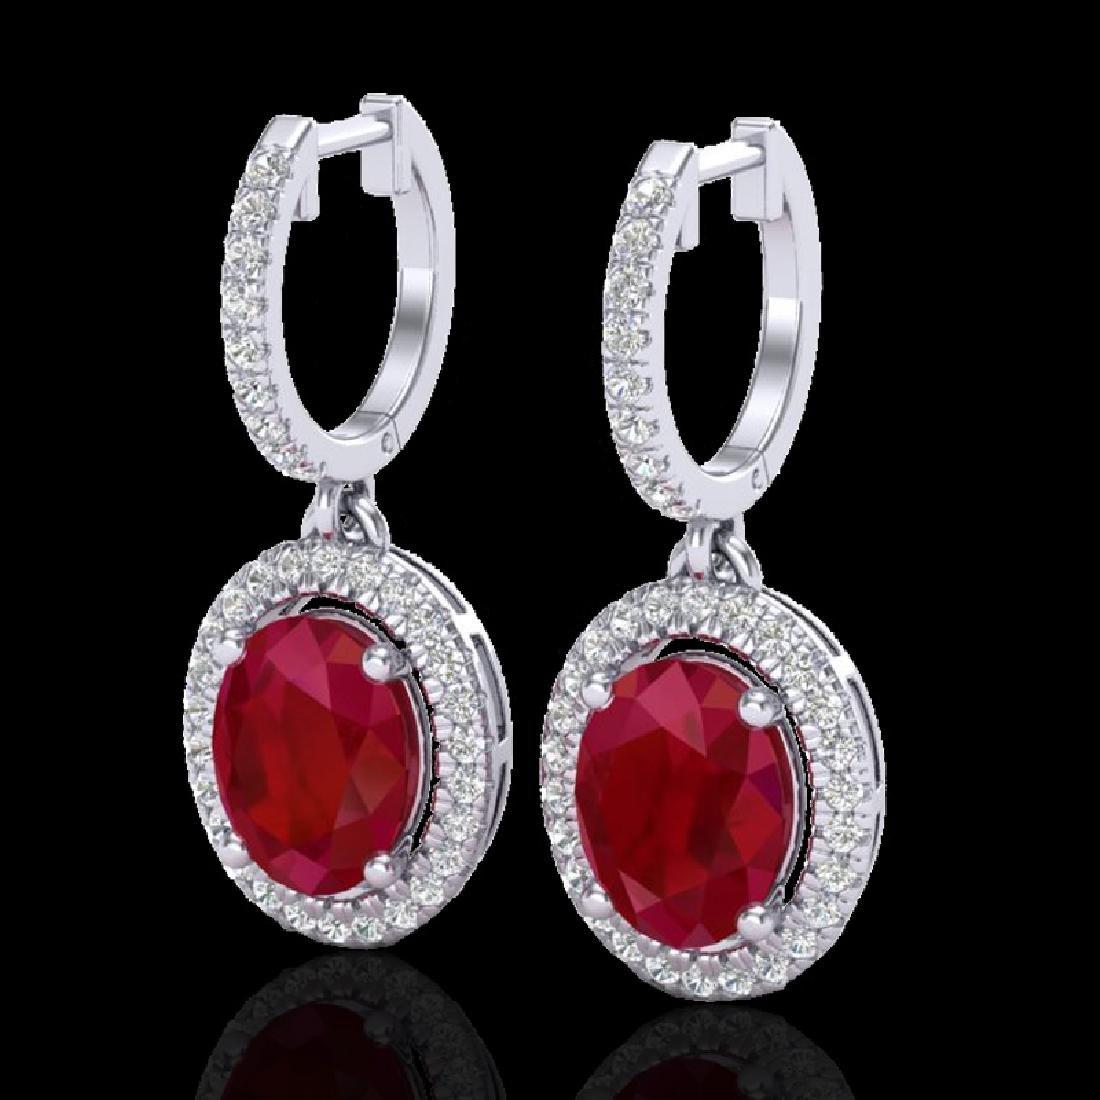 4.25 CTW Ruby & Micro Pave VS/SI Diamond Earrings